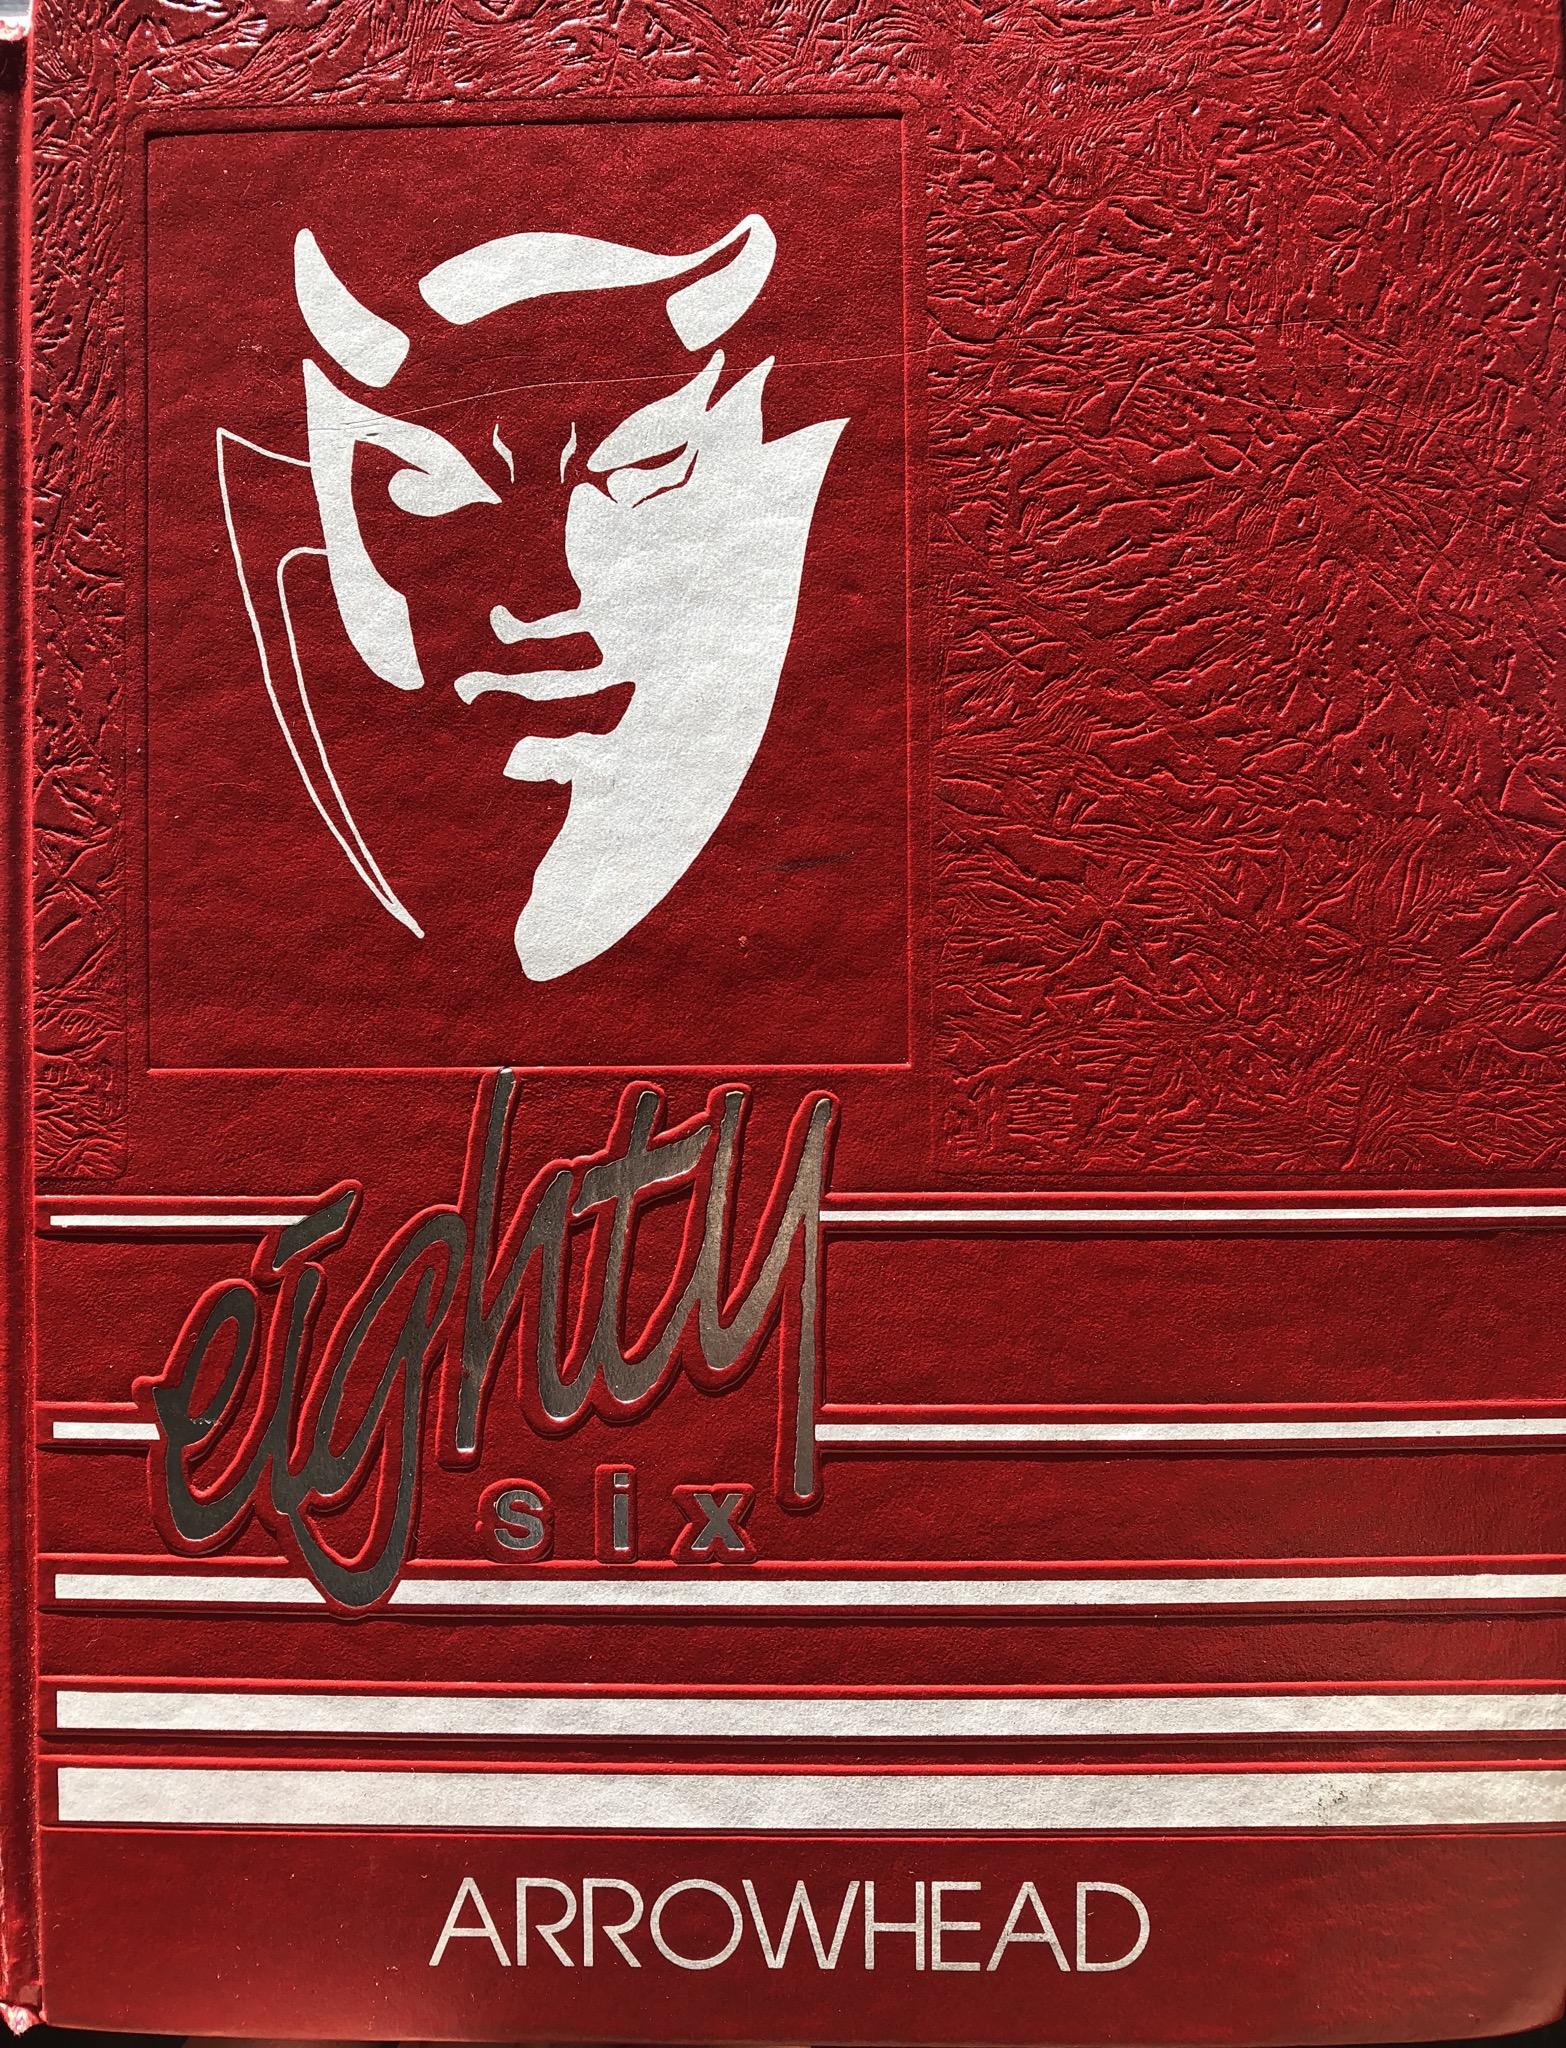 1986 Burlington High School yearbook, Burlington MA